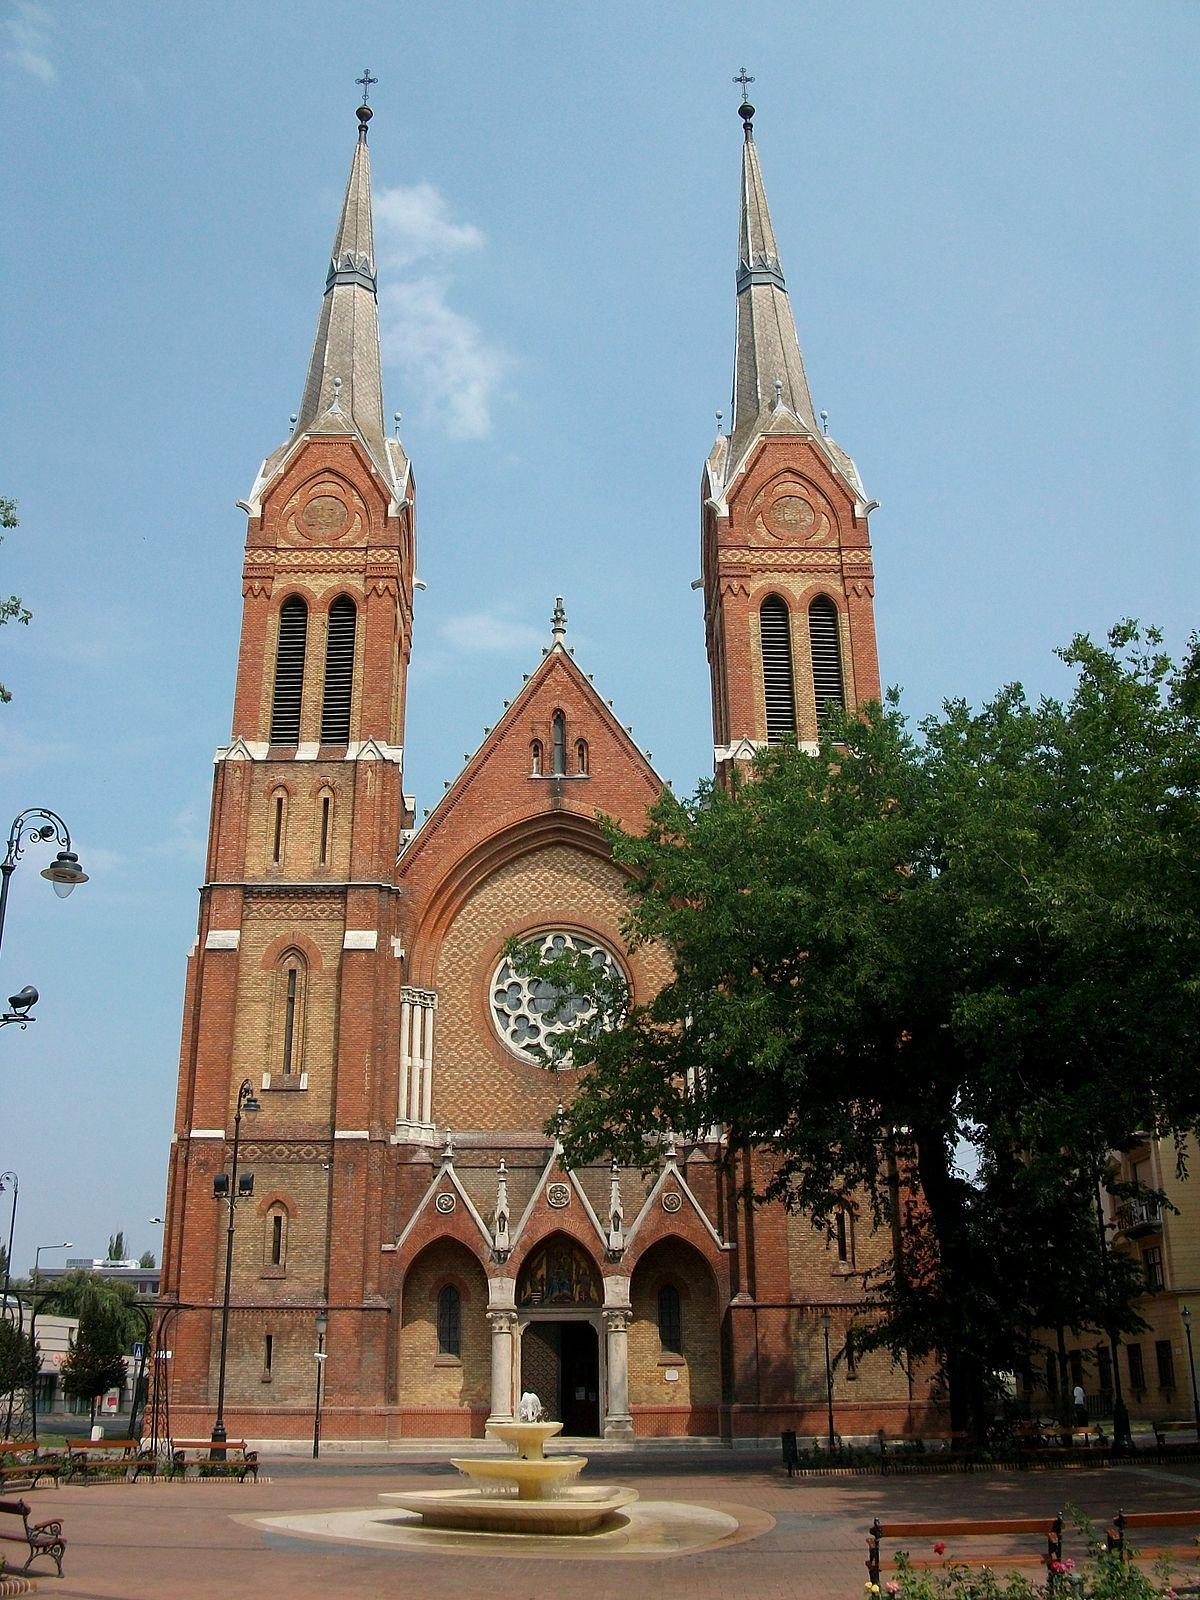 CoCathedral of St Anthony of Padua Bkscsaba  Wikipedia